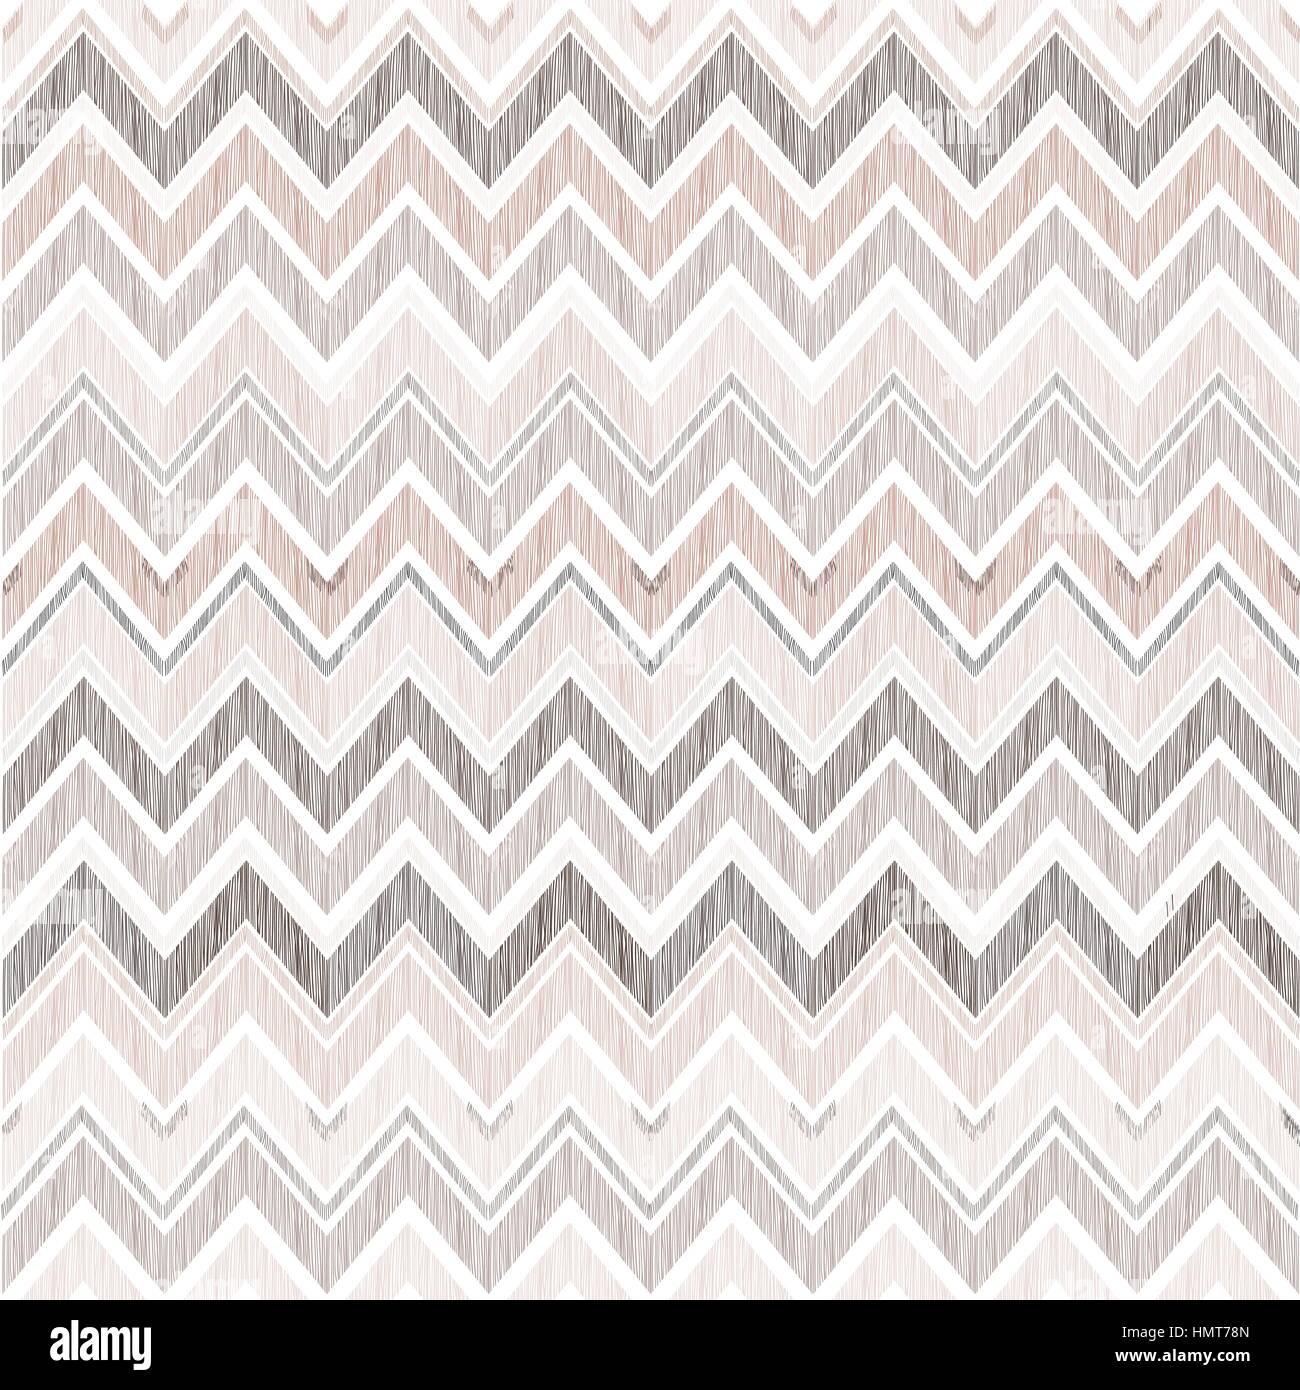 Abstract geometric seamless pattern  Fabric doodle zig zag